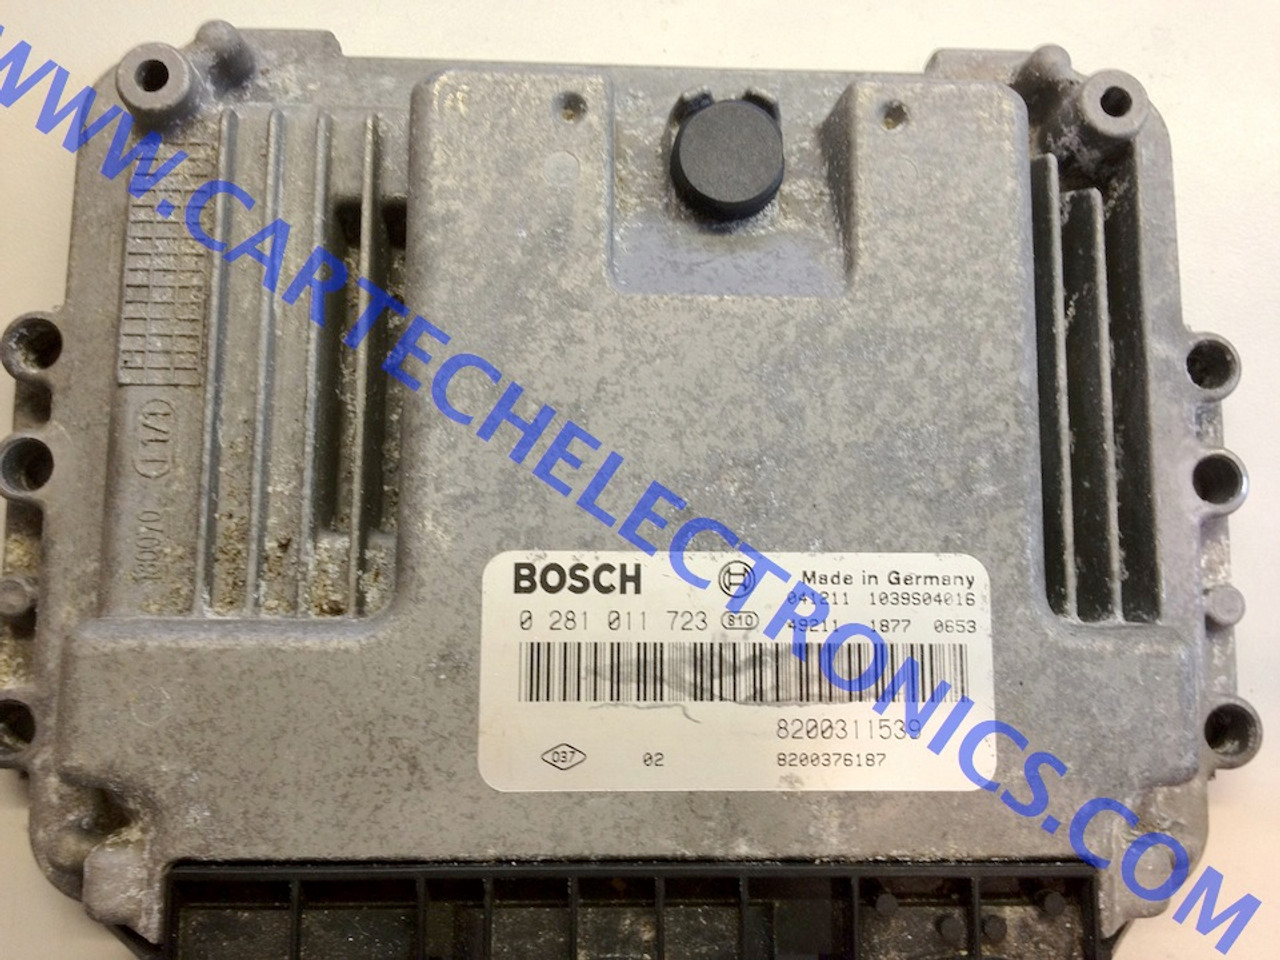 Plug & Play Bosch Engine ECU, Renault 1.9 DCi, 0281011723, 0 281 011 723, 8200311539, 8200376187